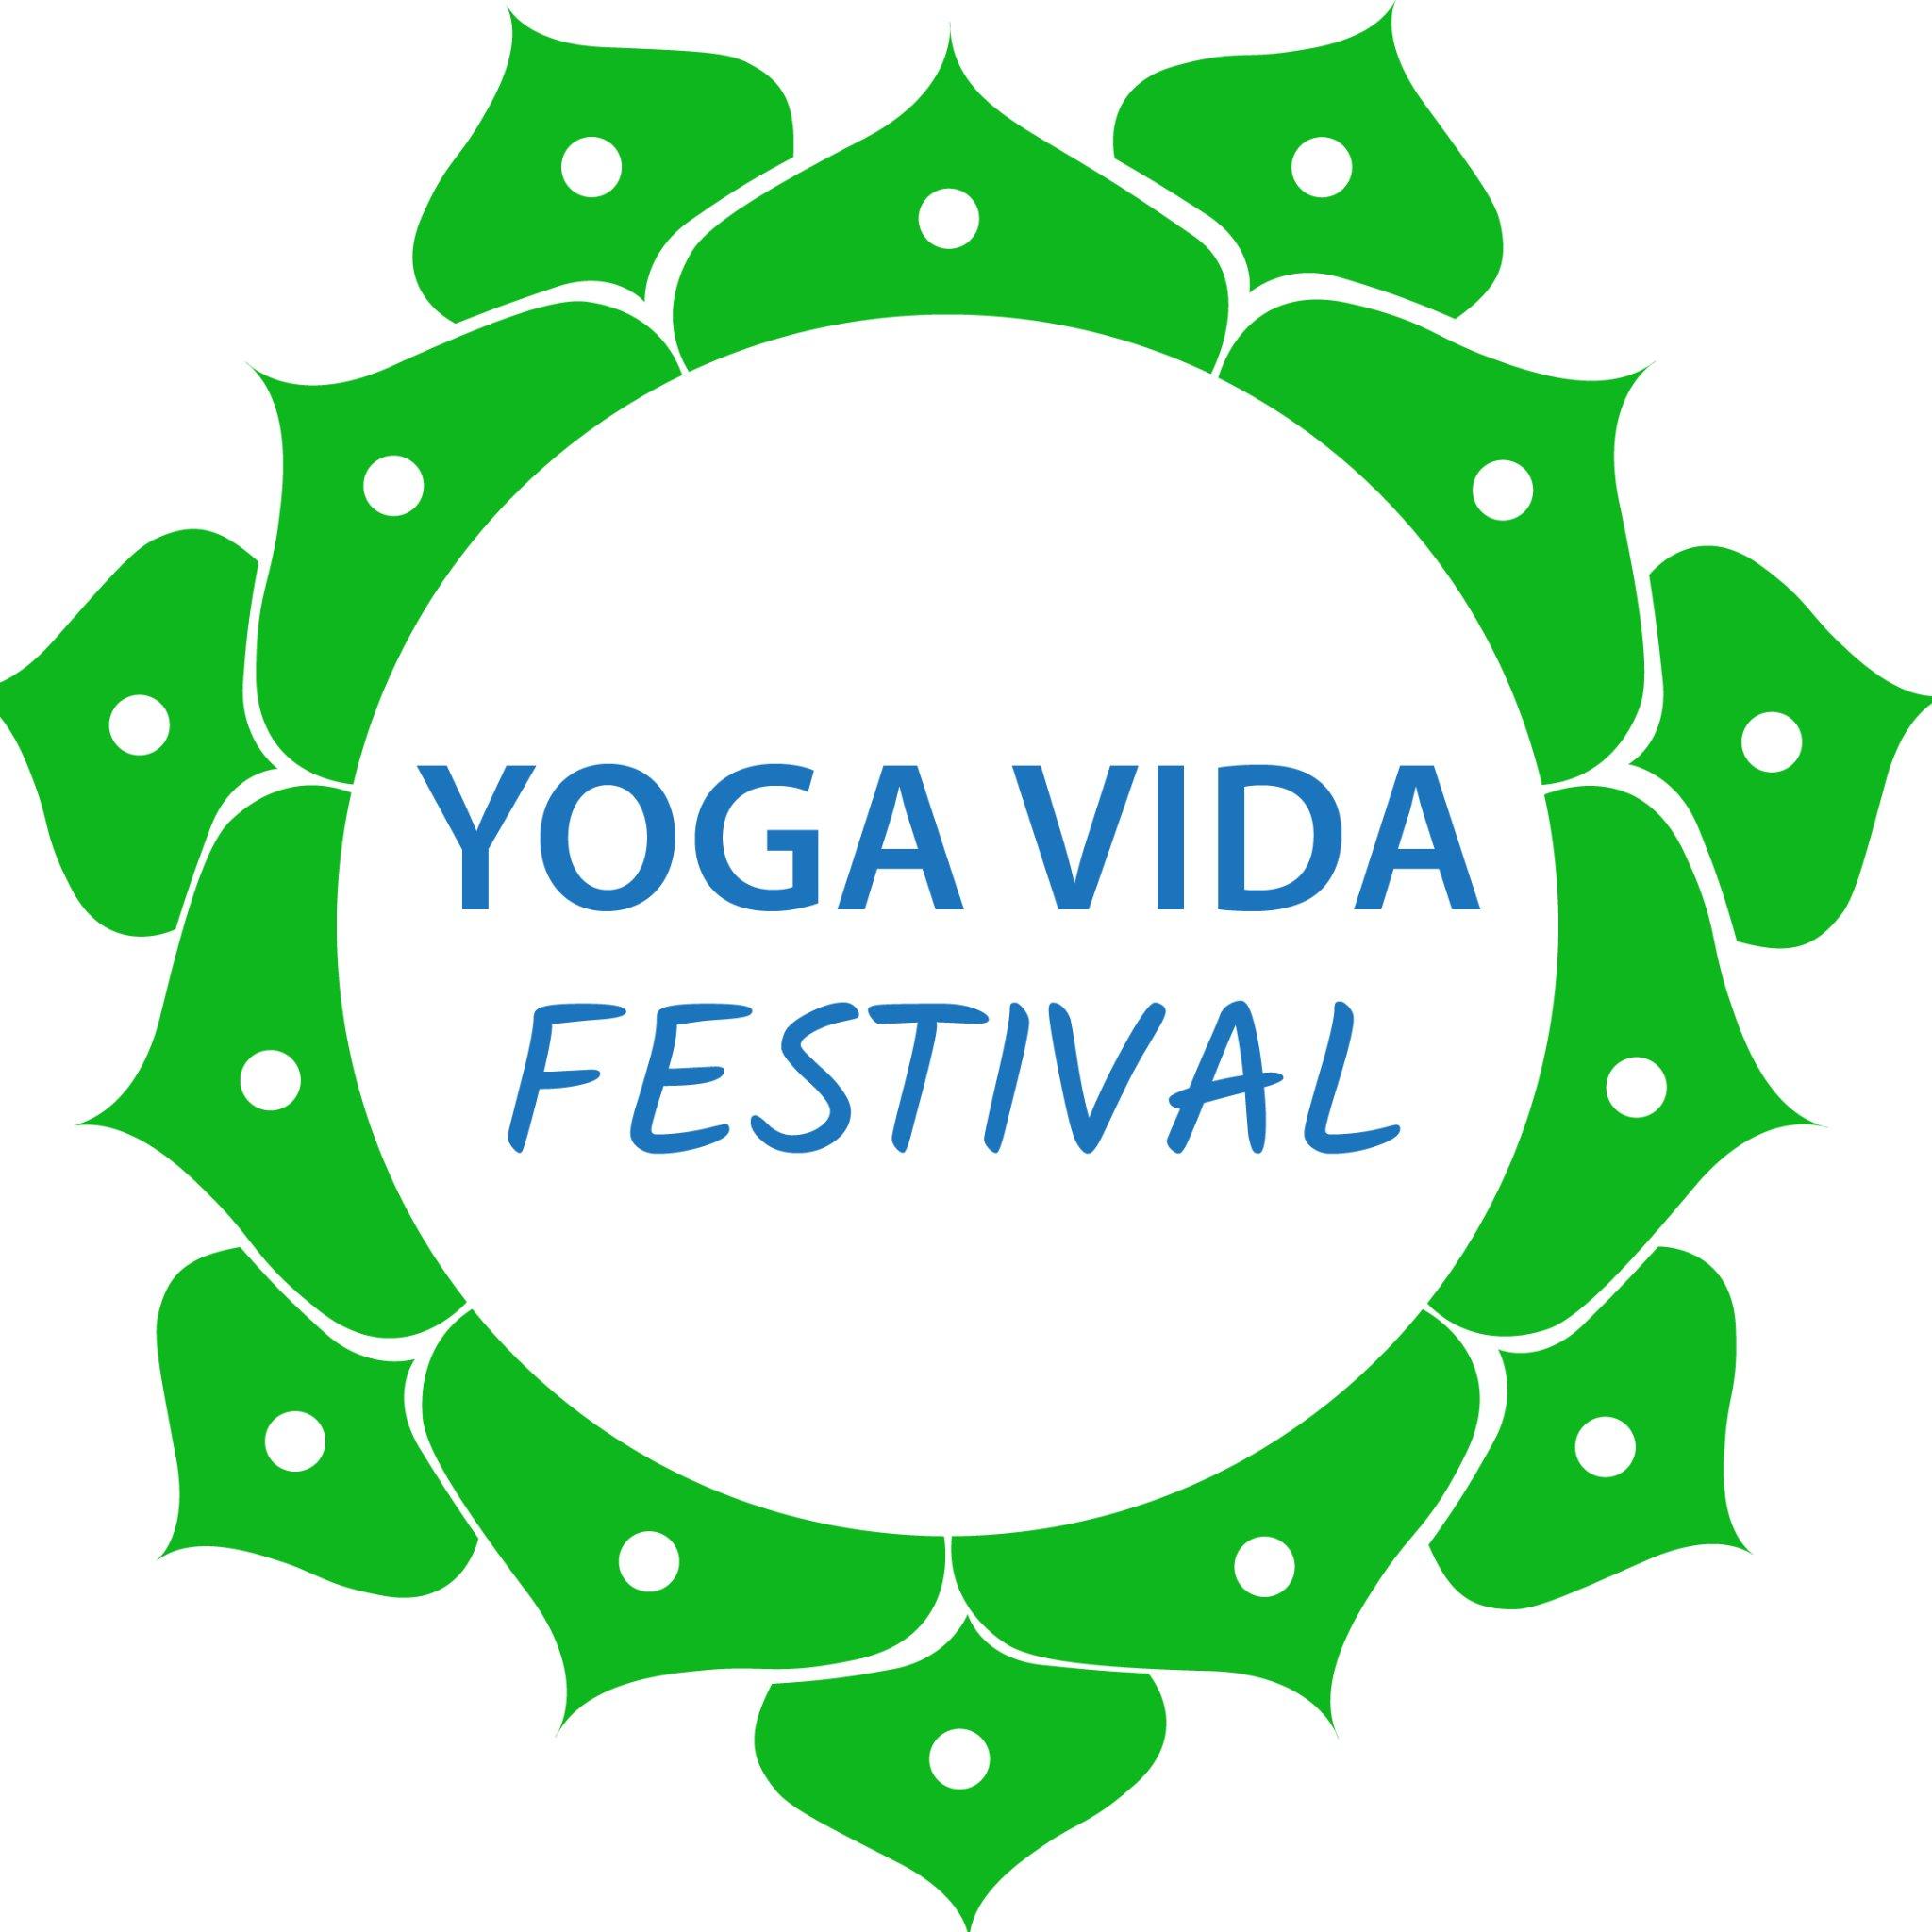 yoga vida festival